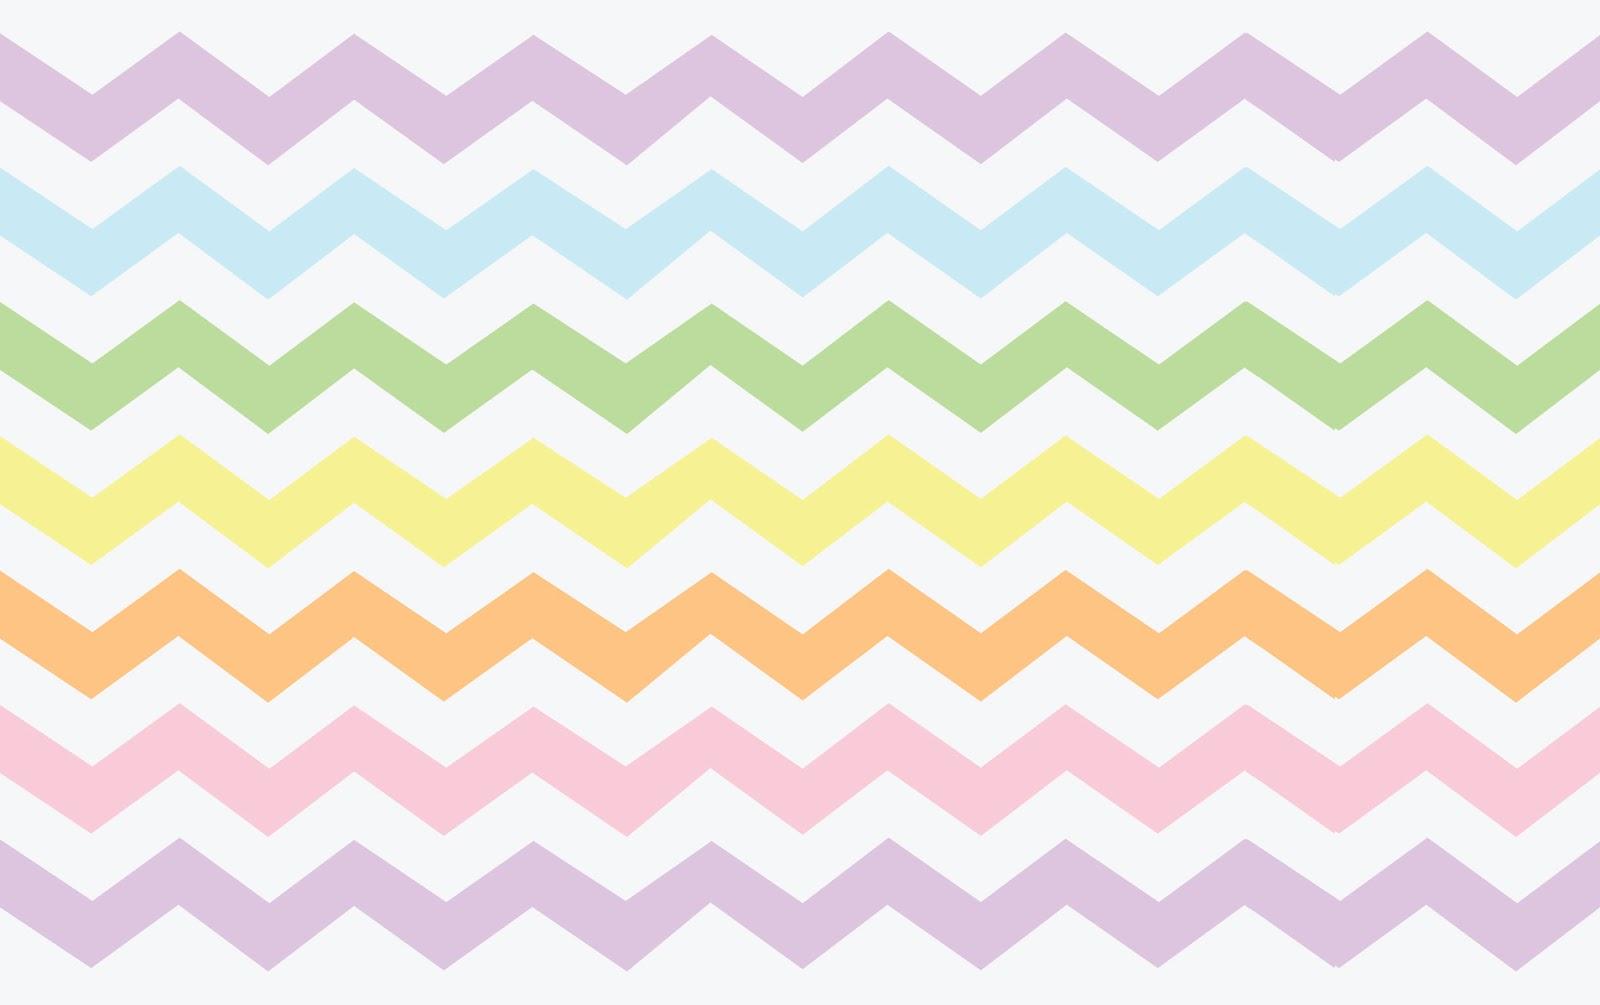 turquoise zigzag wallpapers pinterest - photo #34